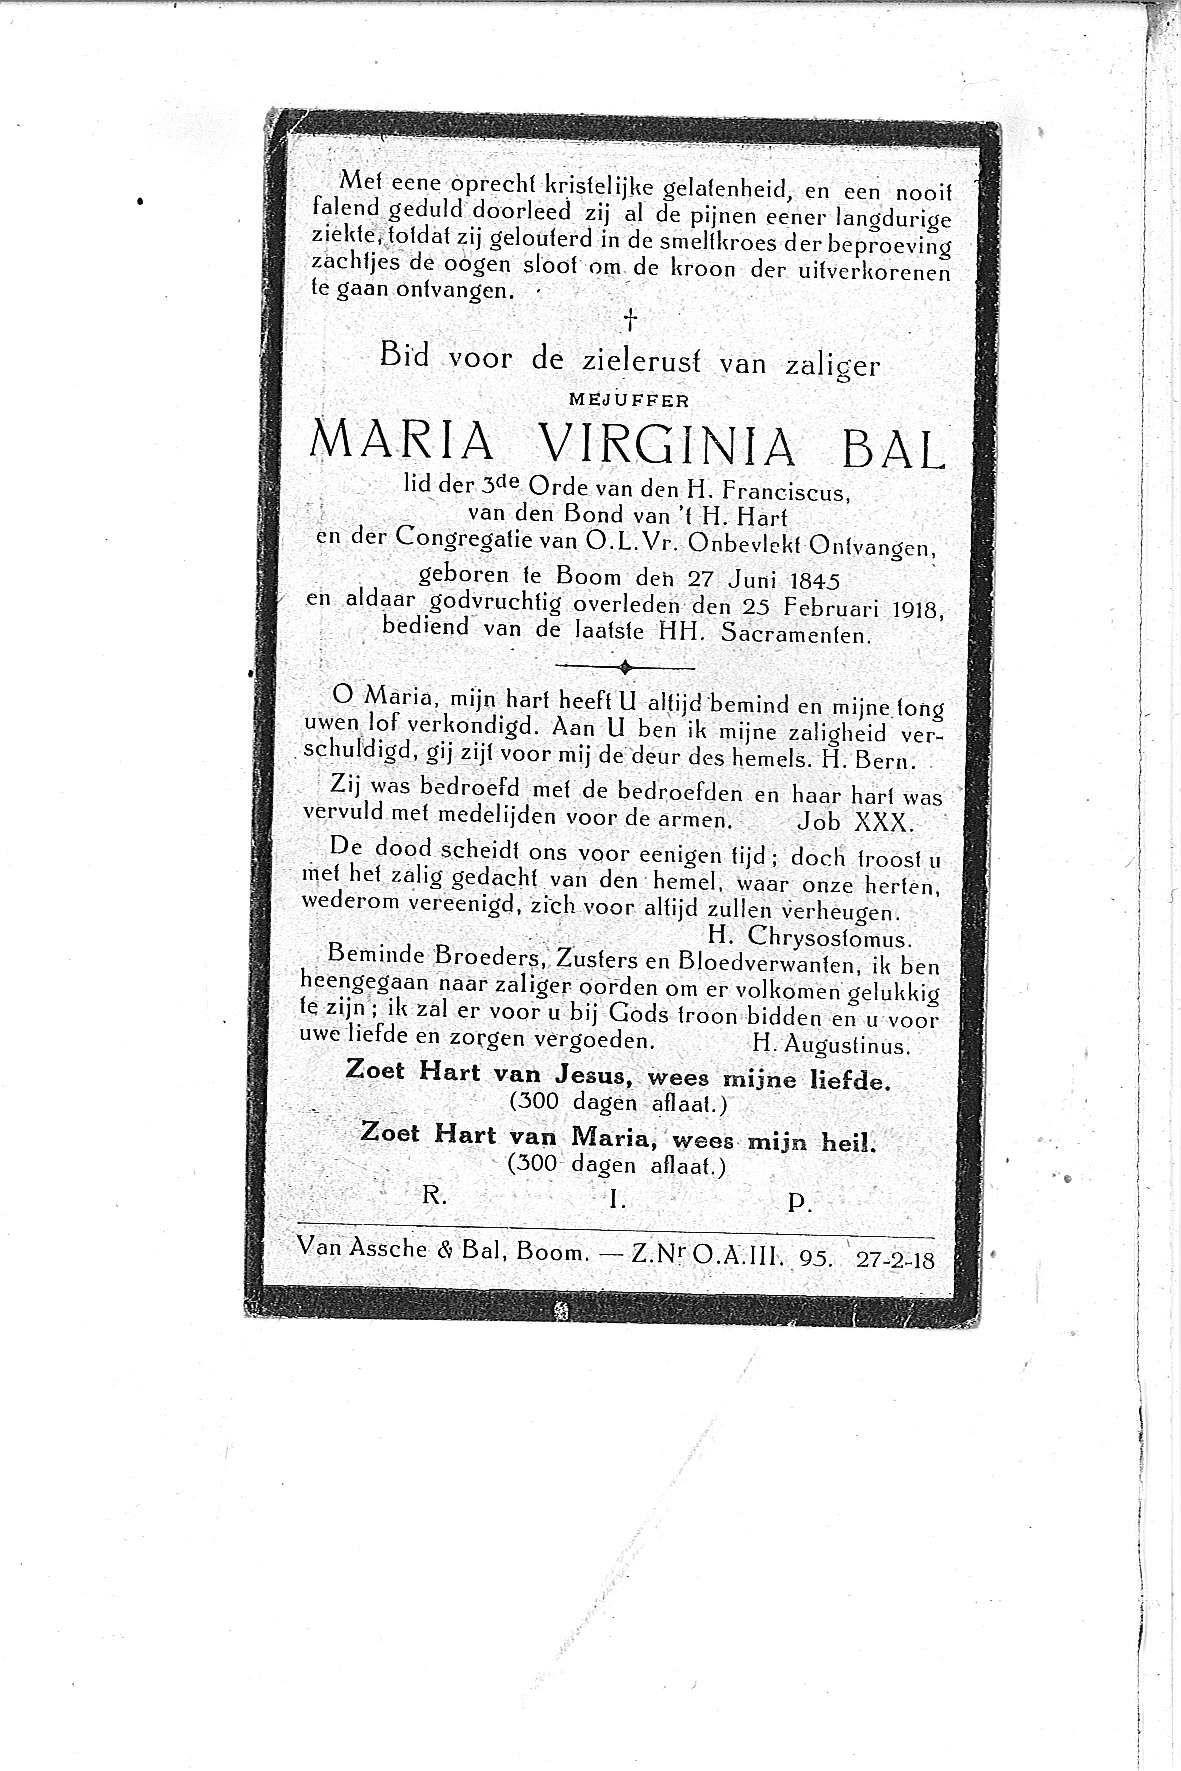 Maria-Virginia(1918)20101006151440_00009.jpg